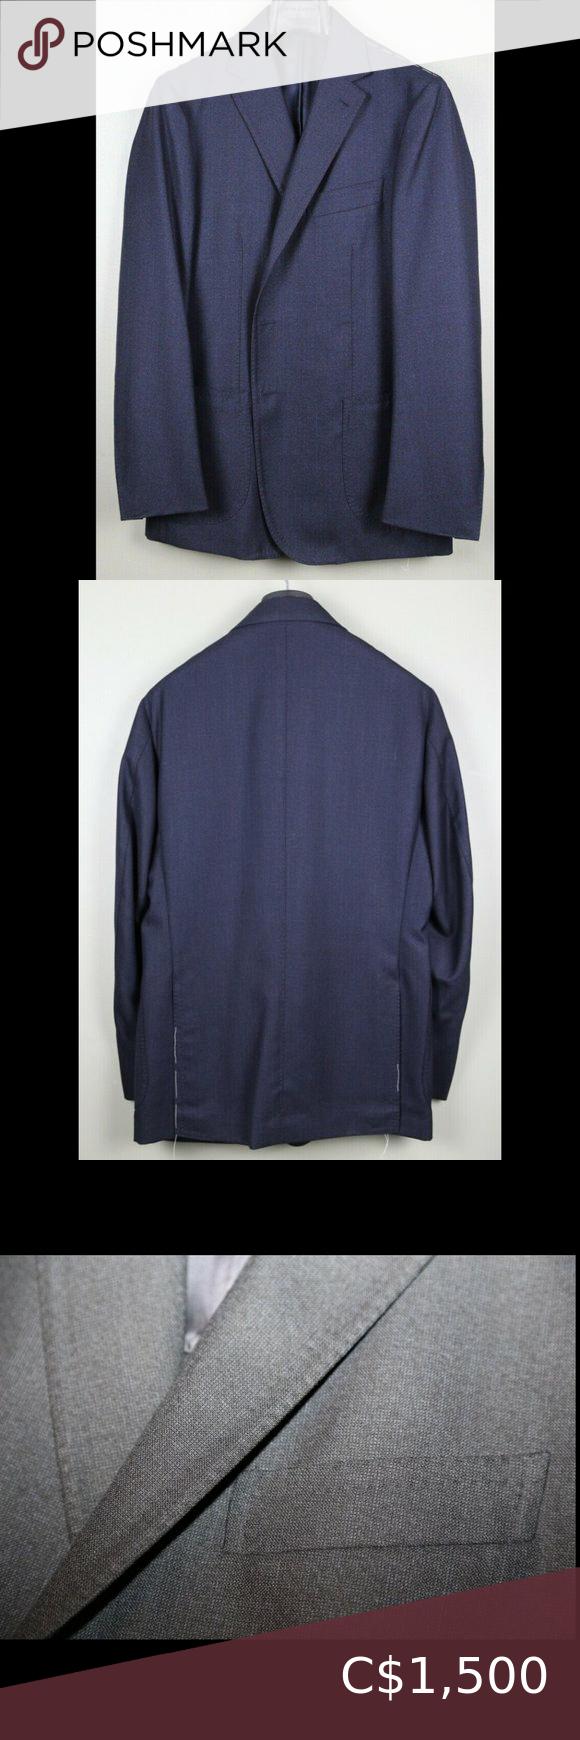 NWT $5K Stile Latino 40US Wool Sport Jacket